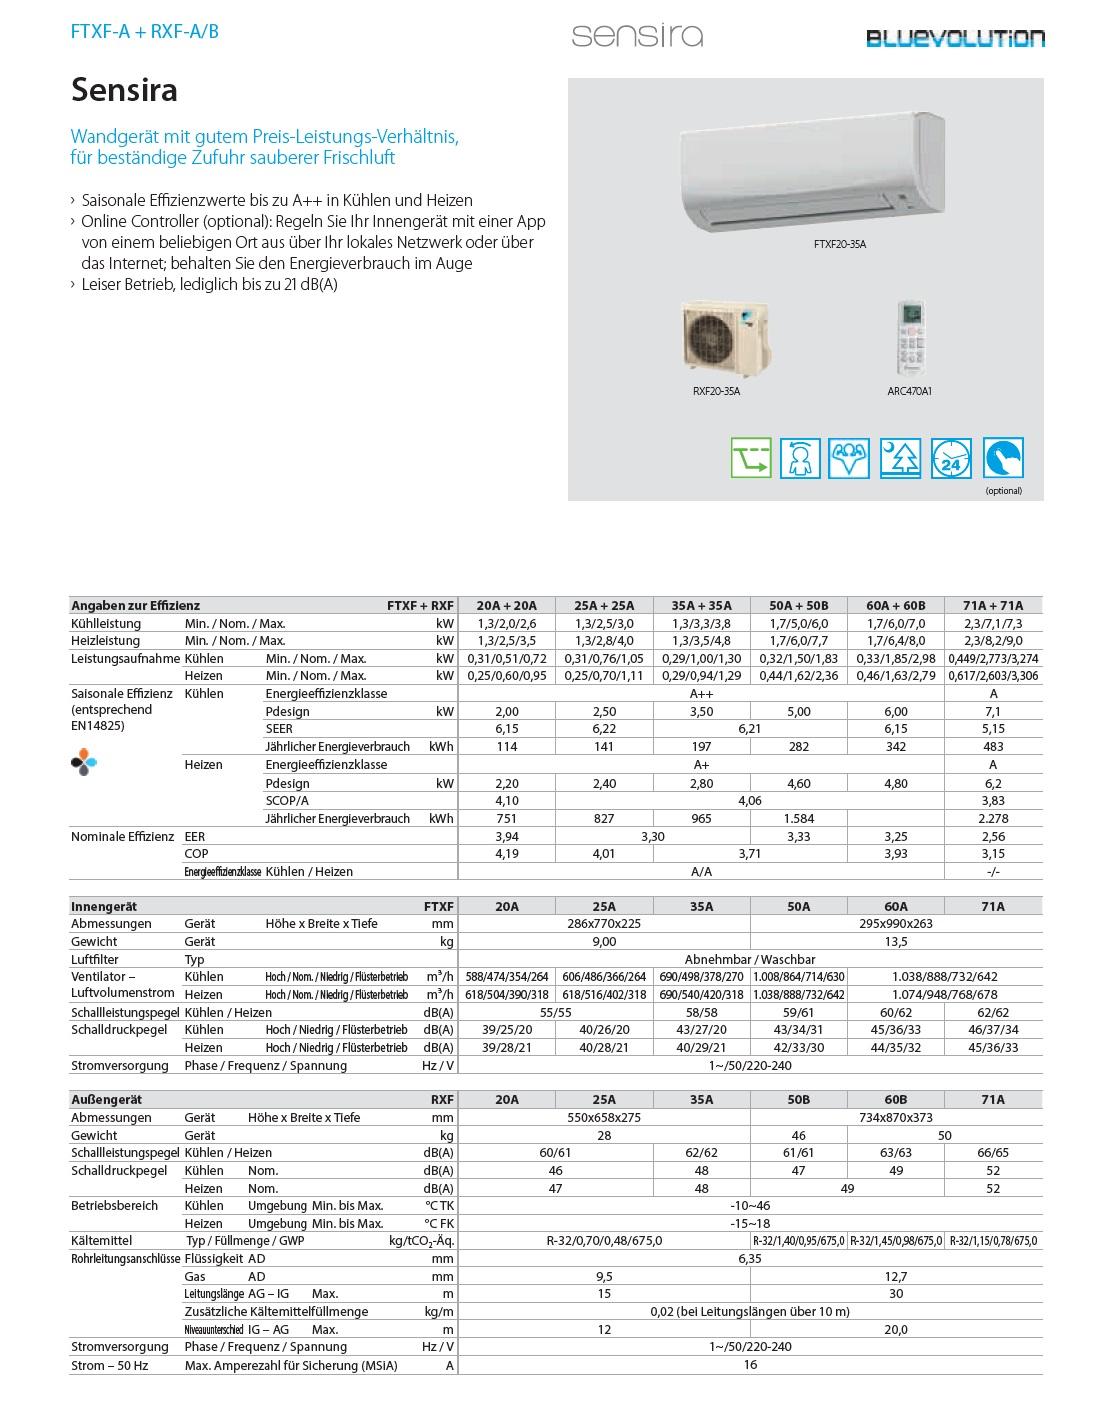 Klimaanlagen Daikin Mono Split 21000 Btu Serie Sensira FTXF-A A++/A+